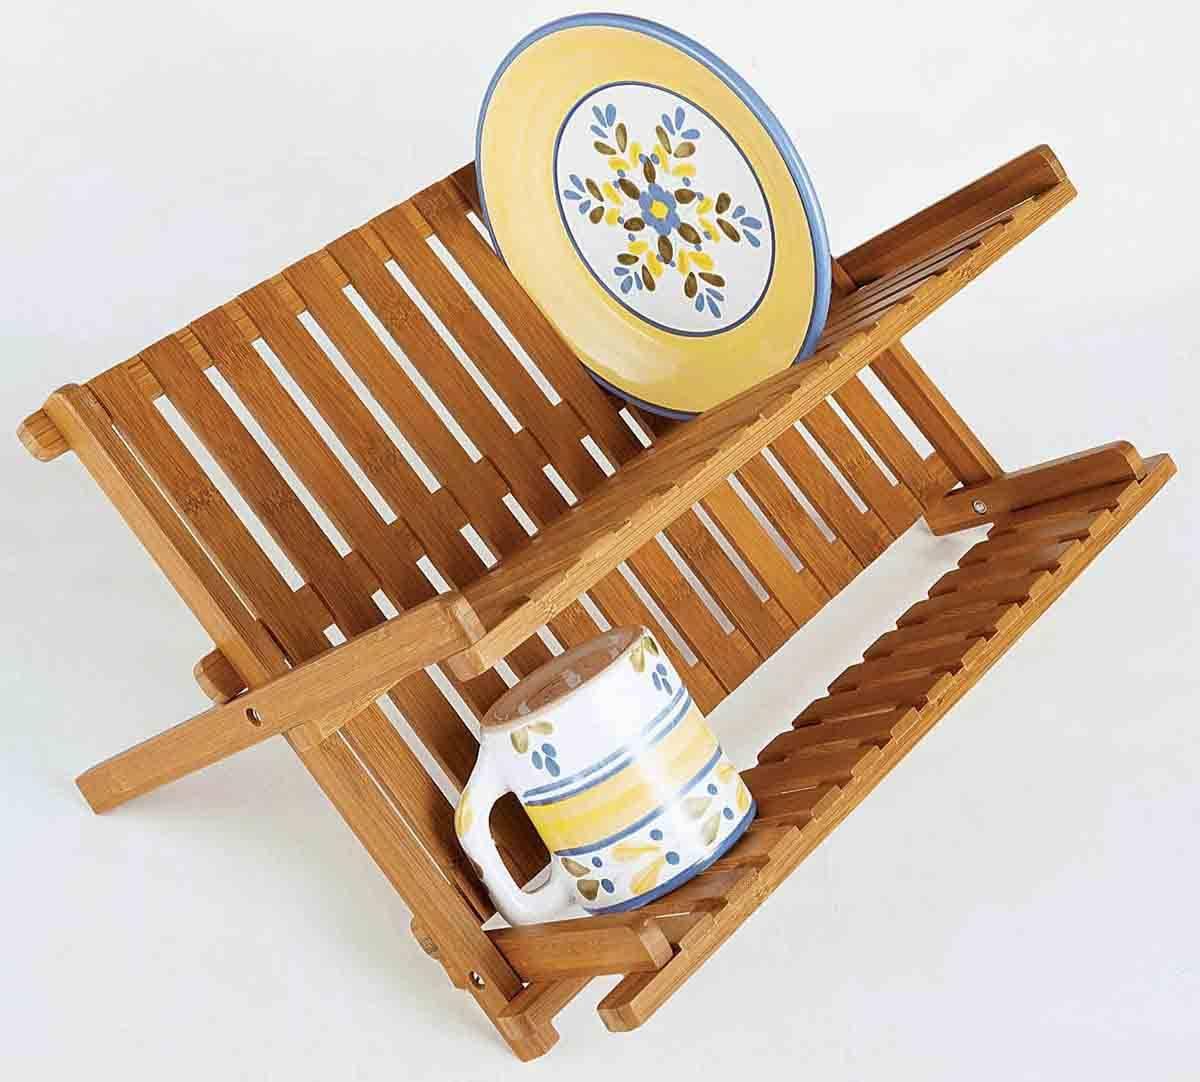 BH002/Bamboo Scissor Style Folding Dish Rack Plate Flatware Holder Set